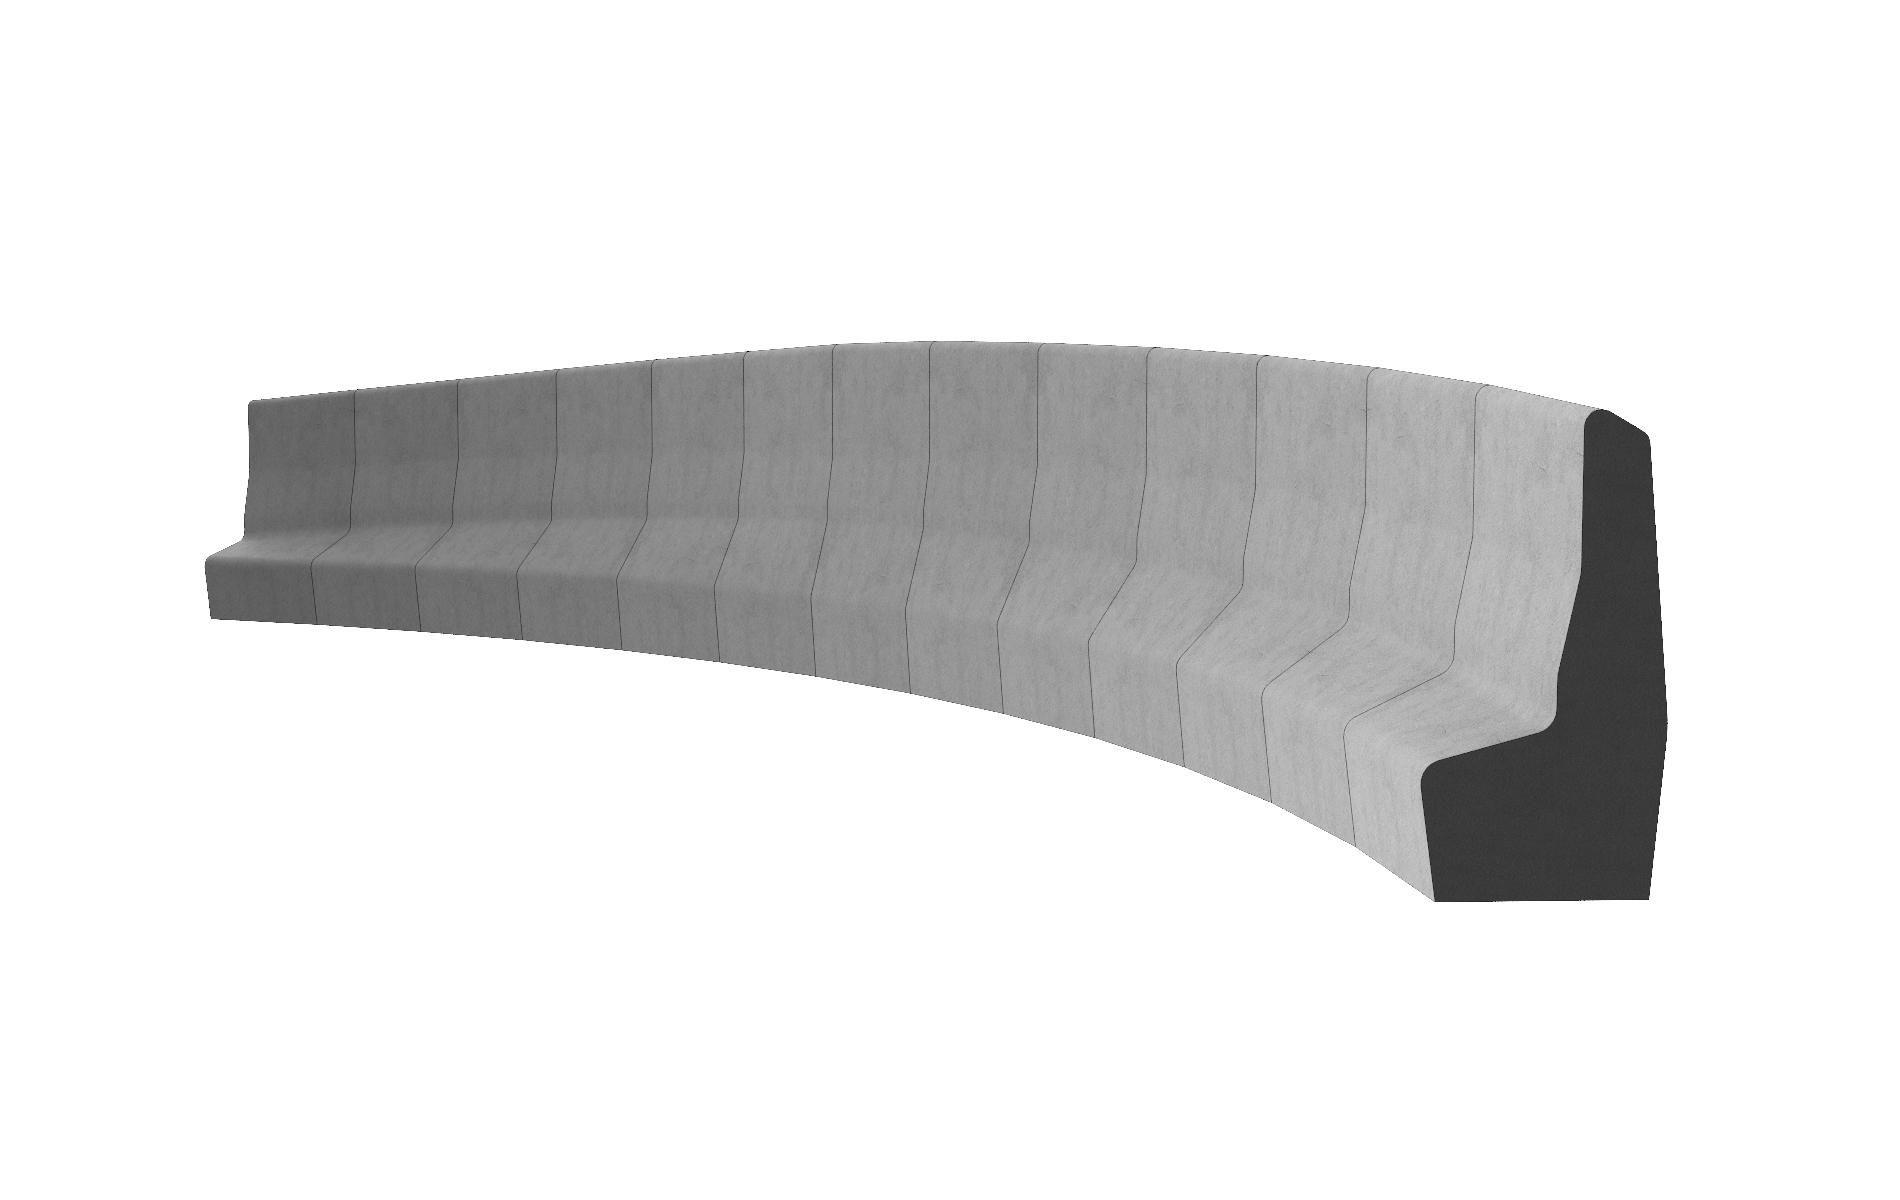 Изображение seating 24-04-05_01 (moduЕ'owa ERGO CONCRETE)